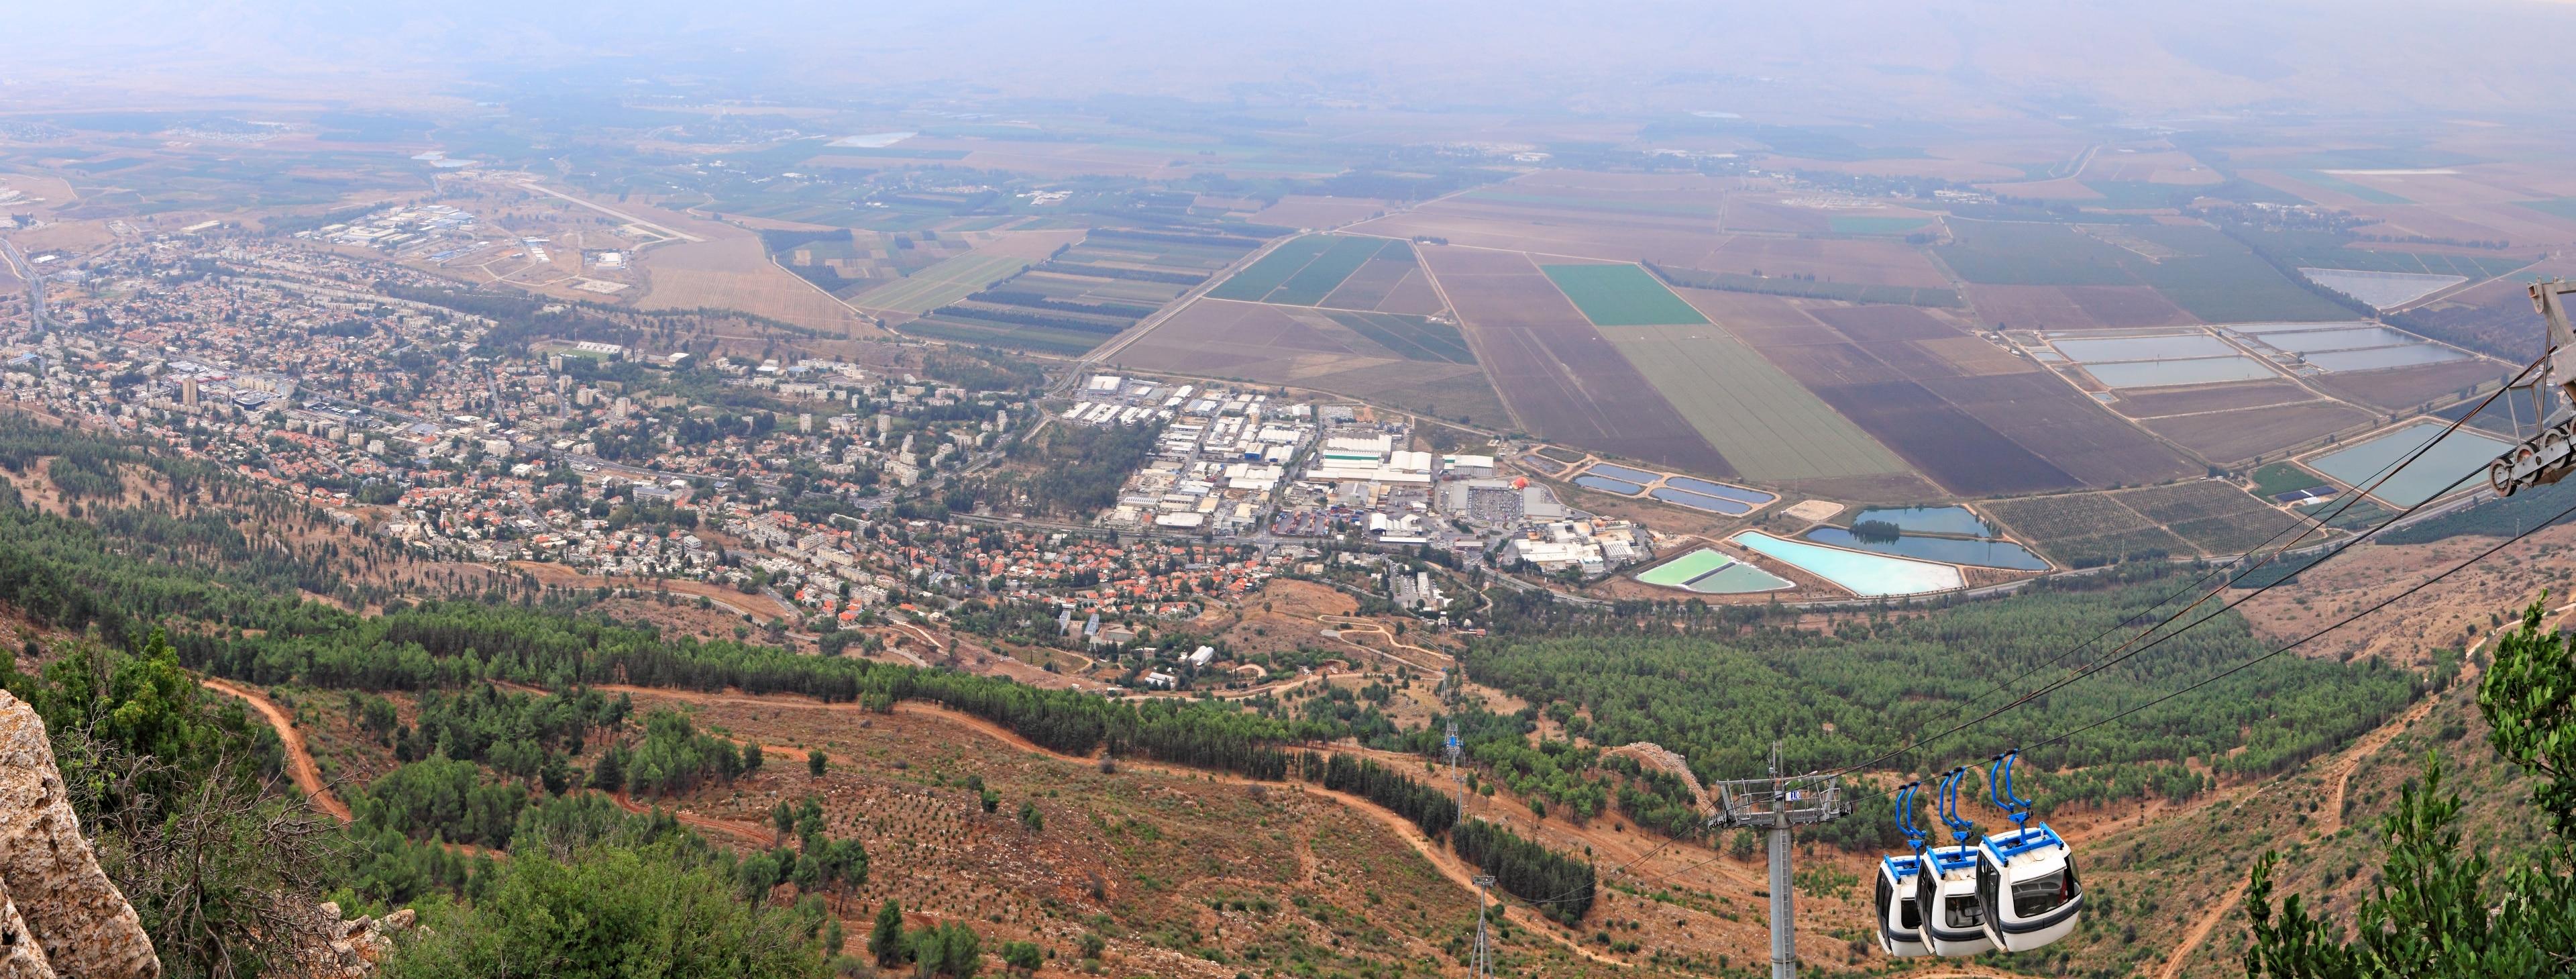 Upper Galilee, Northern District, Israel